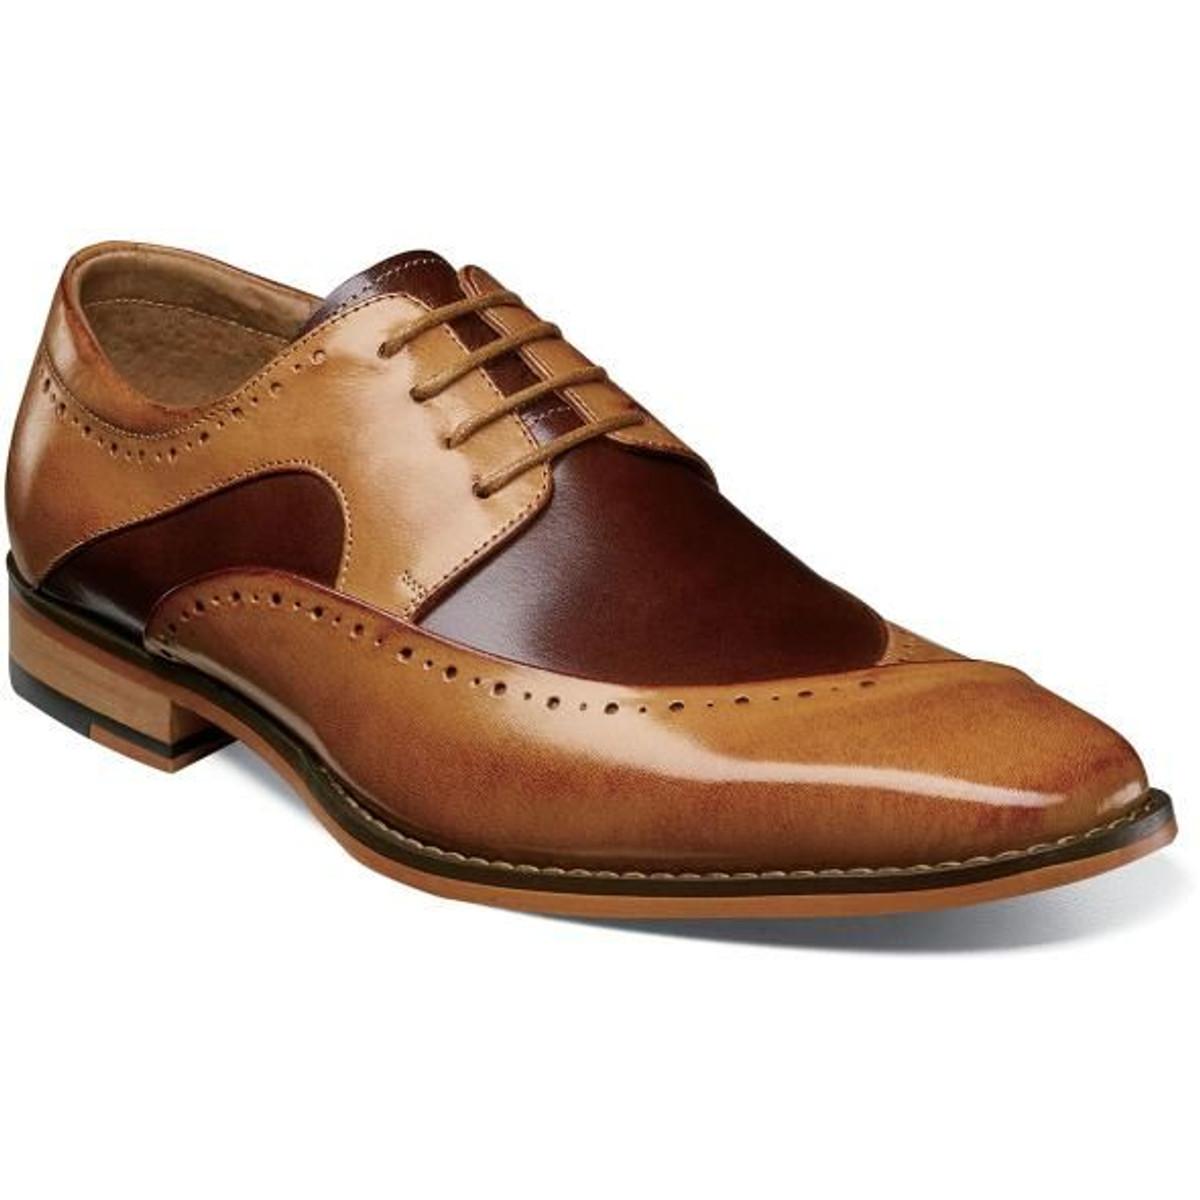 Stacy Adams Dress Shoes Tan Burgundy Top 25292-238 IS